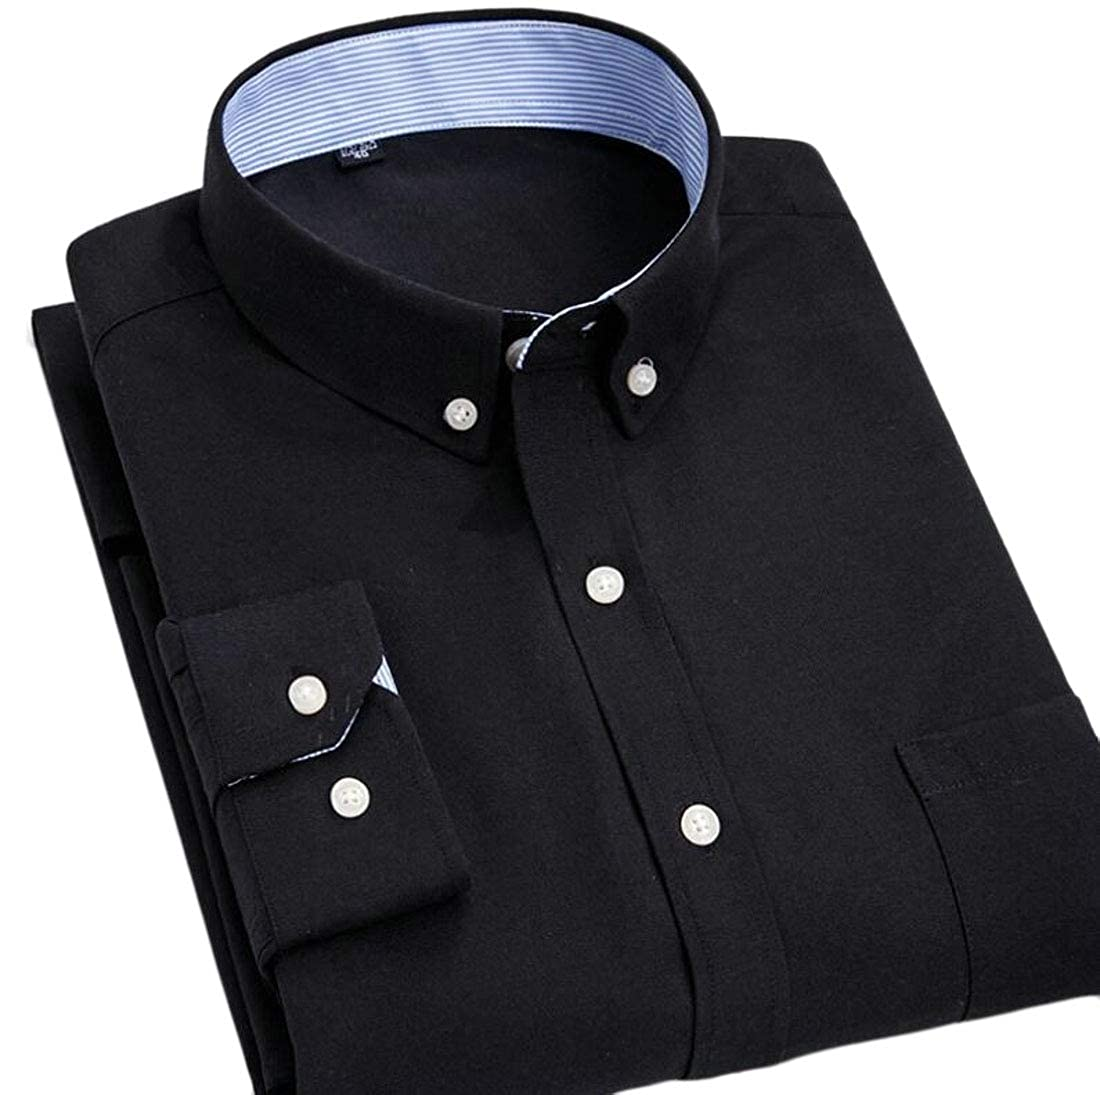 Mens Slim Fit Oxford Shirt Long Sleeve Button Down Collar Dress Shirt